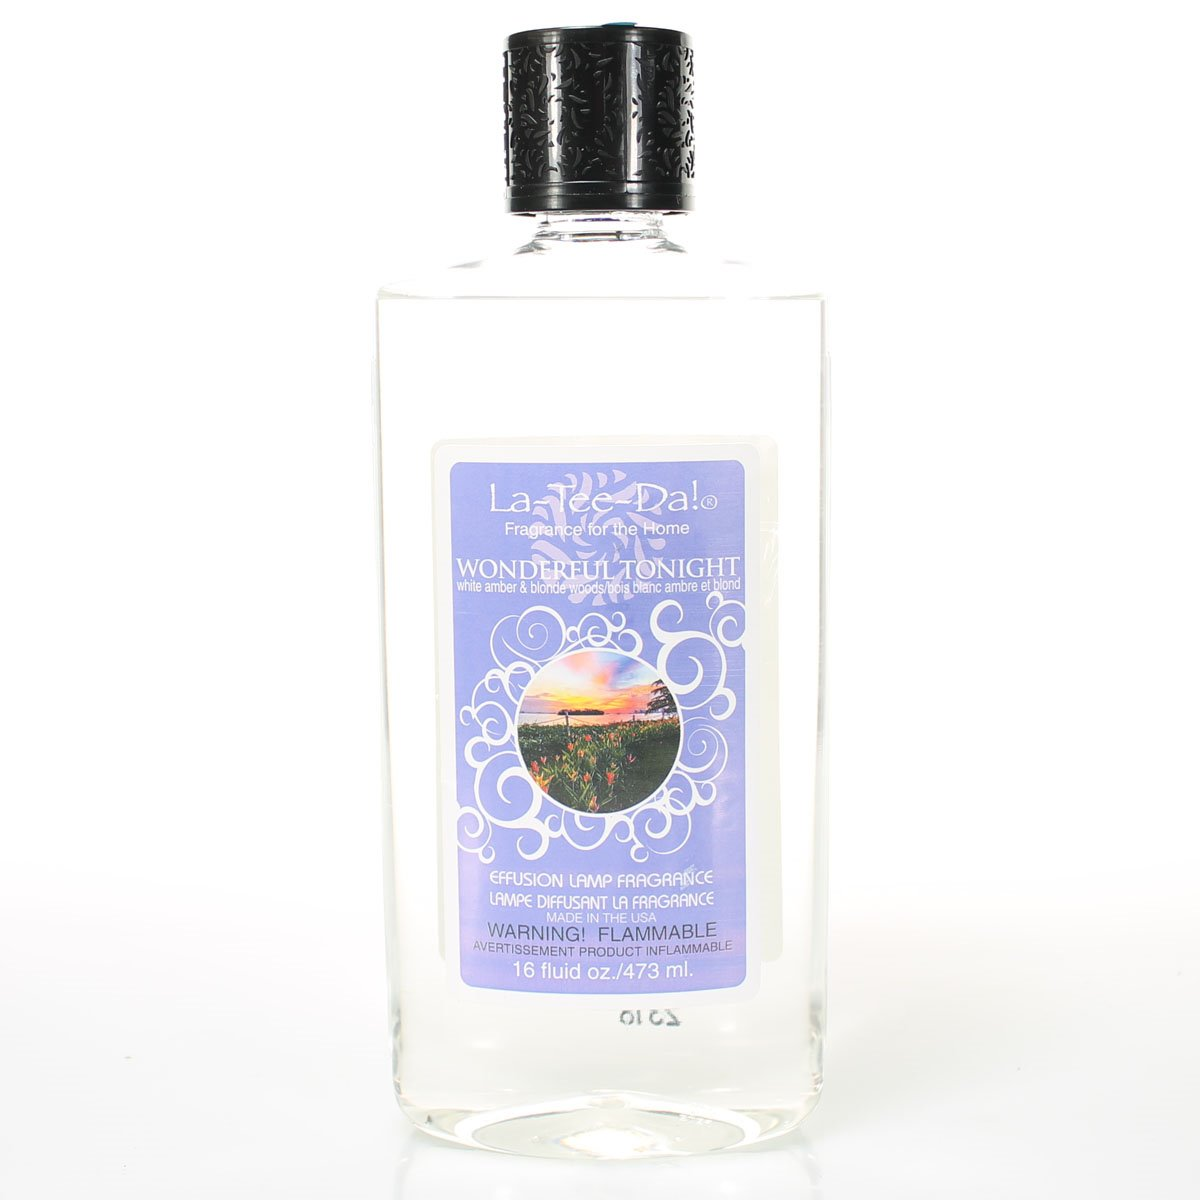 La Tee Da Fuel Fragrance Wonderful Tonight (16 oz.)